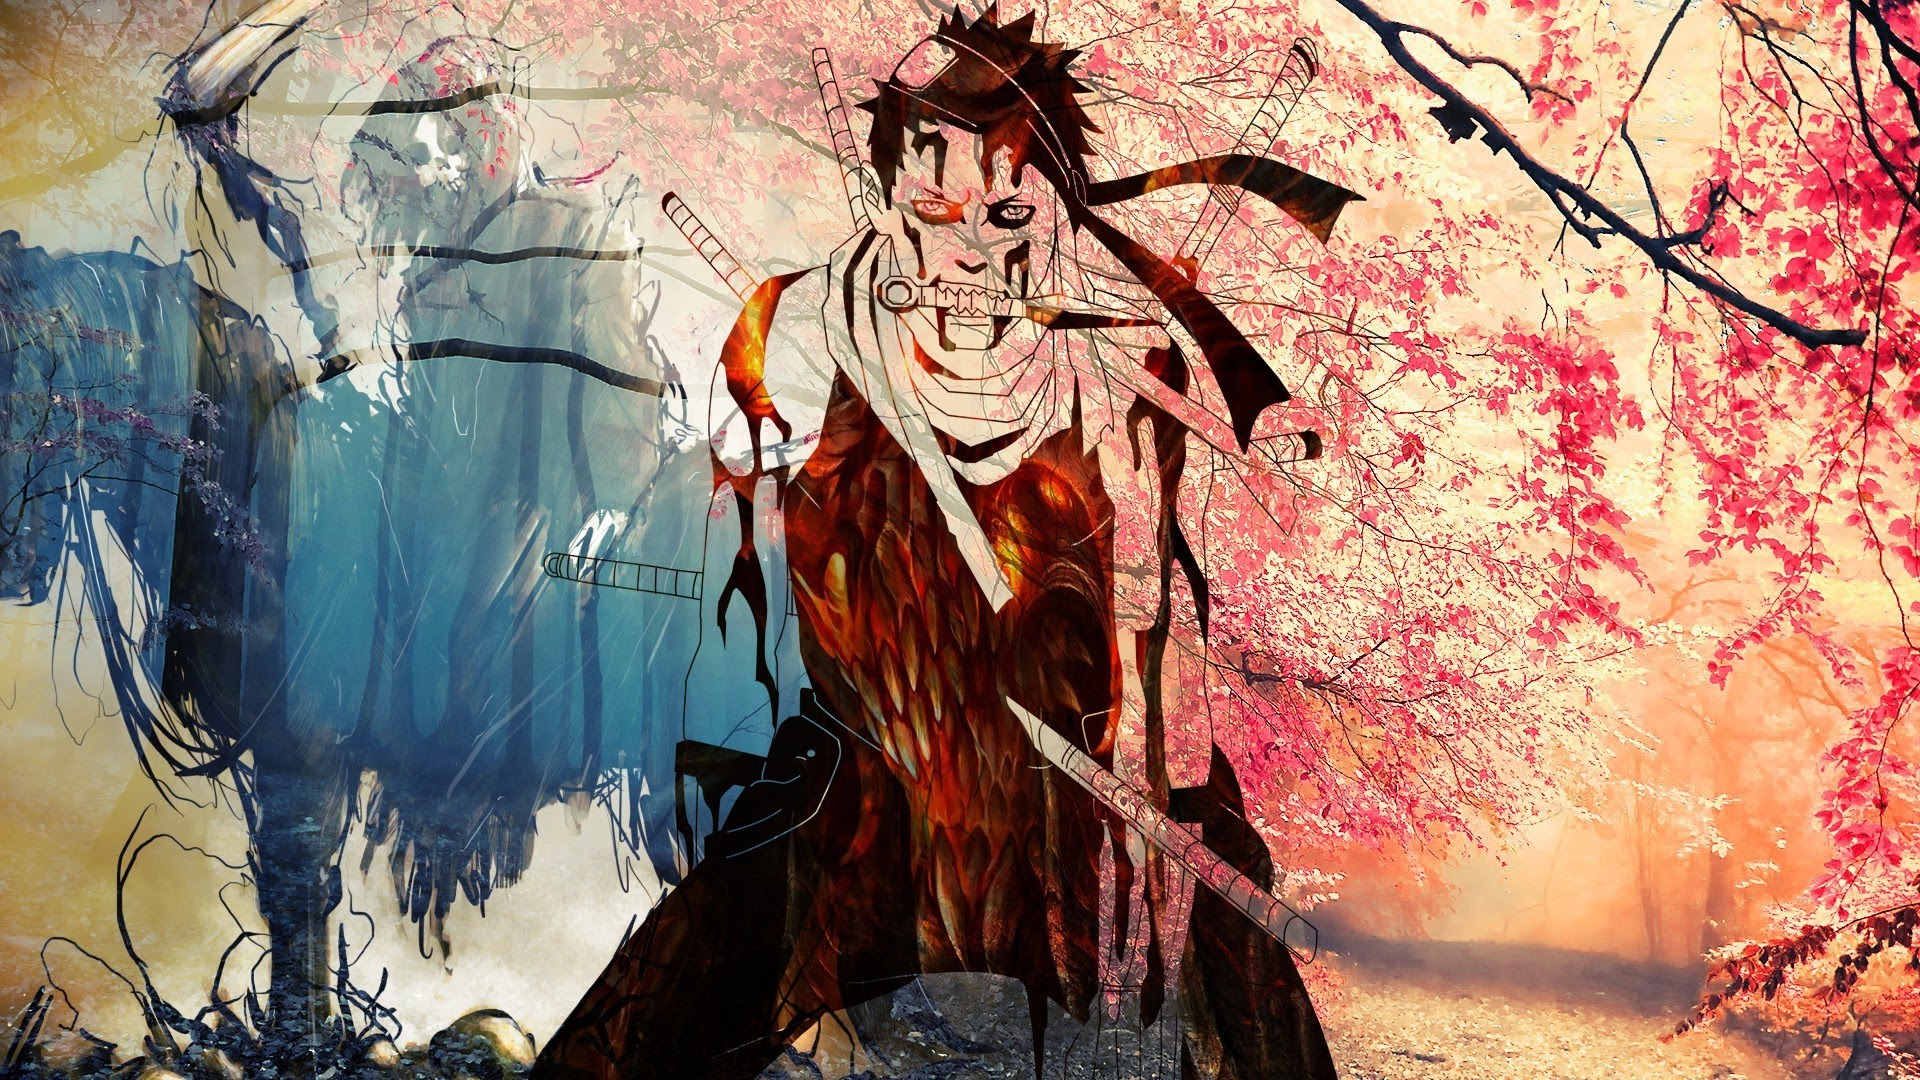 Download 540 Naruto Zabuza Wallpaper Hd Paling Keren Wallpaper Keren